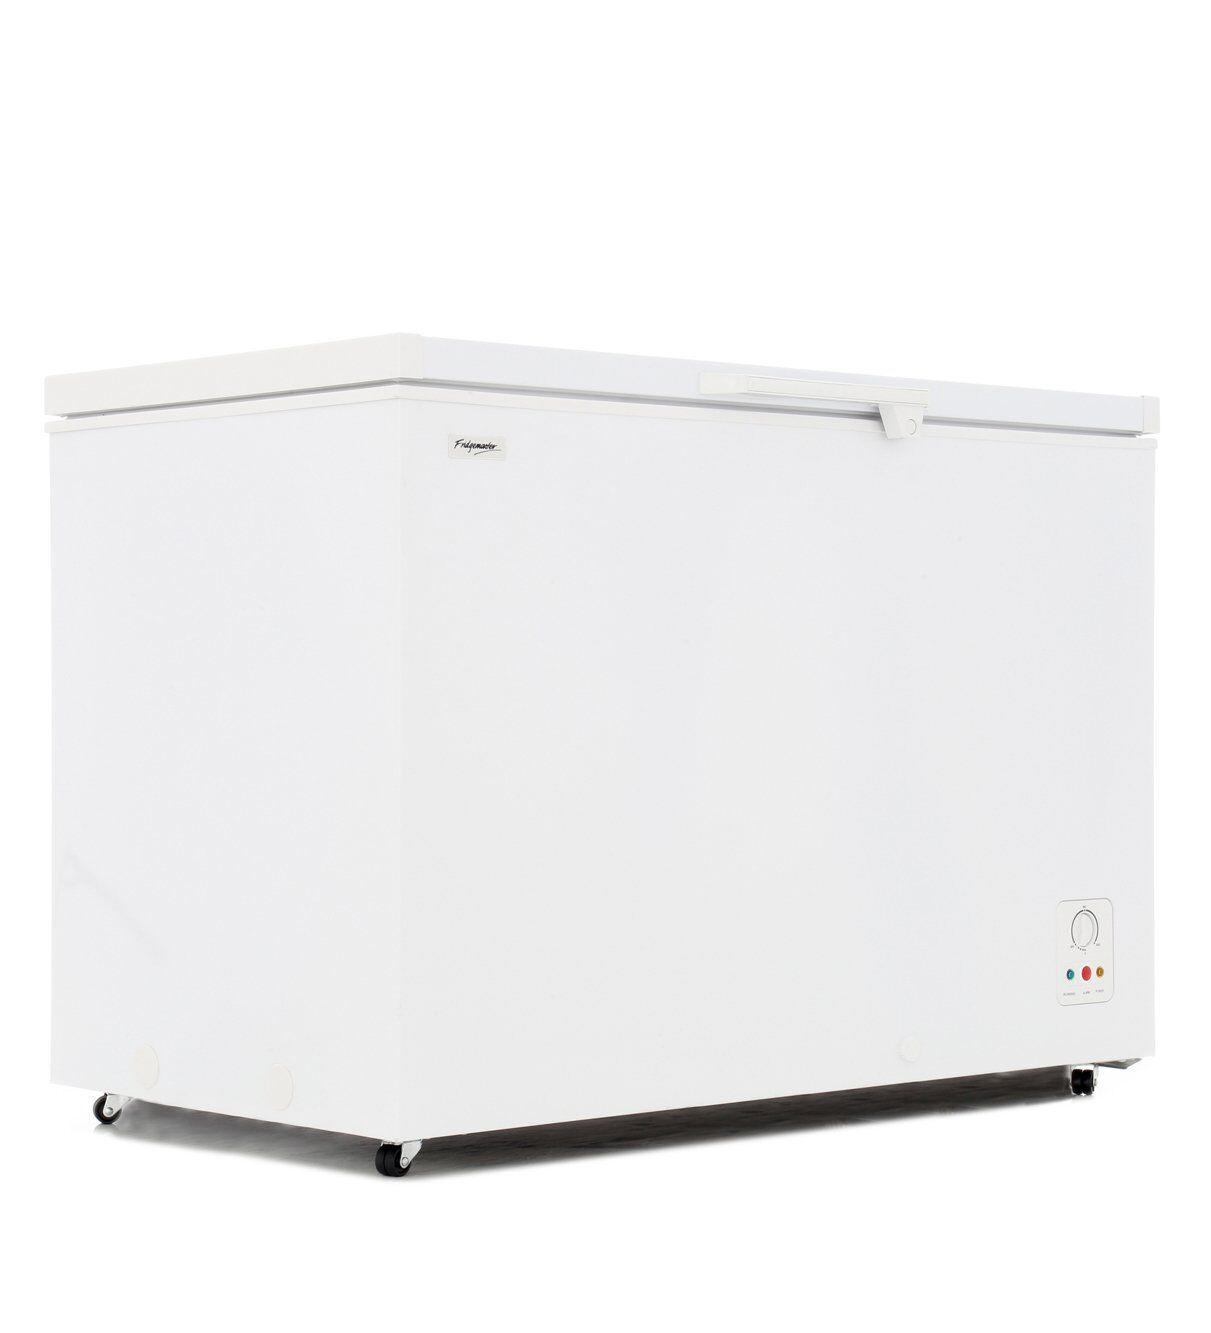 Fridgemaster Static Chest Freezer - White - F Rated - MCF306